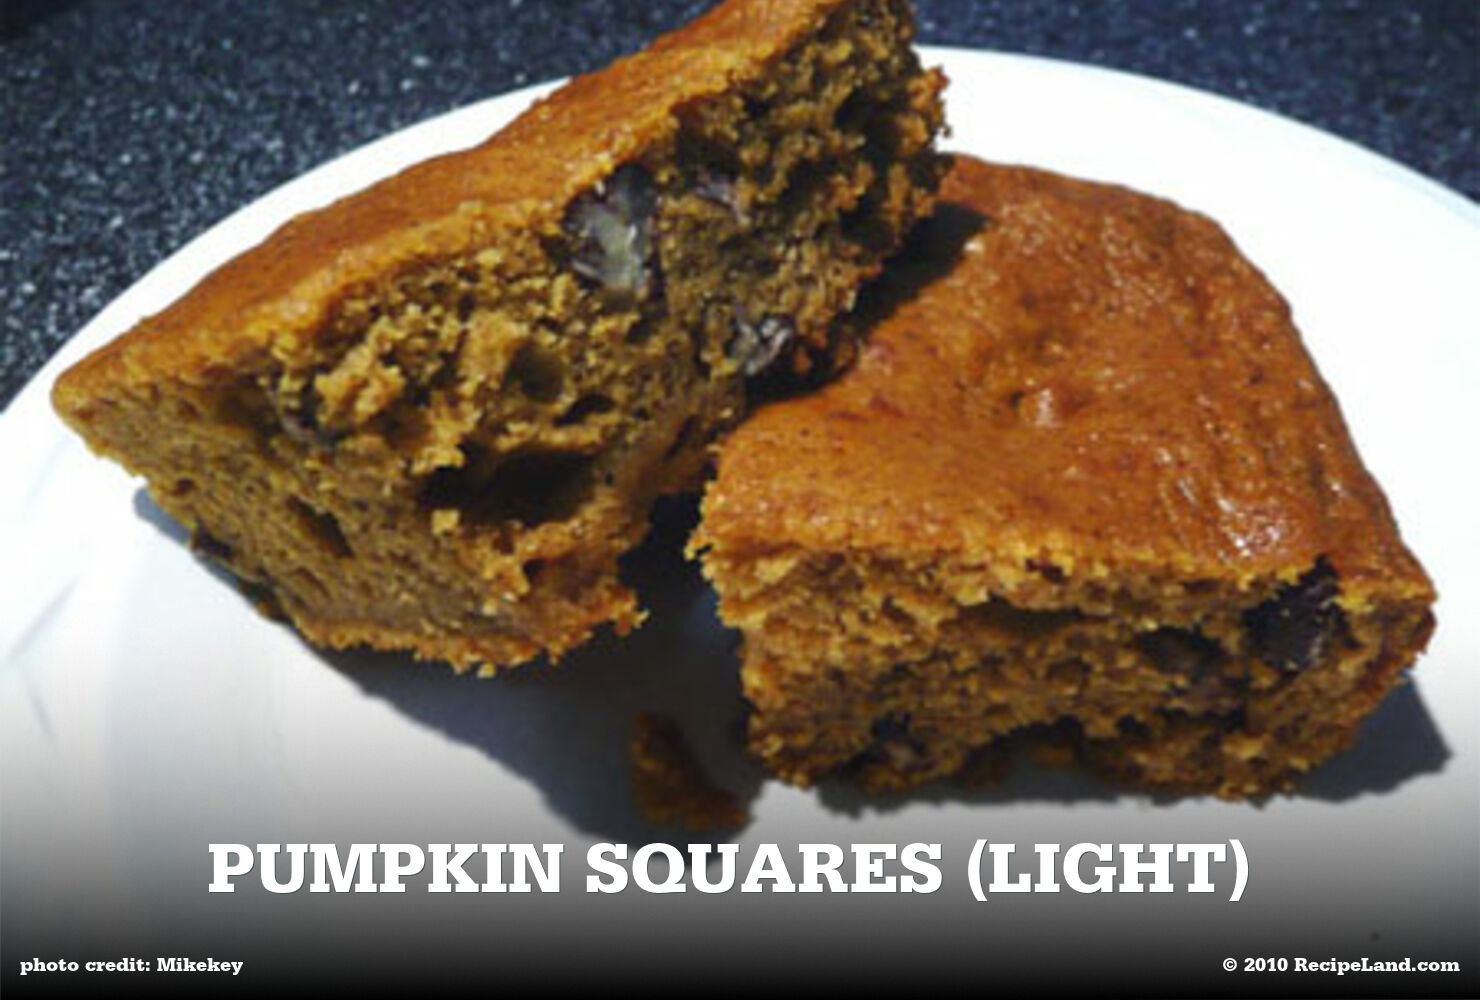 Pumpkin Squares (Light)